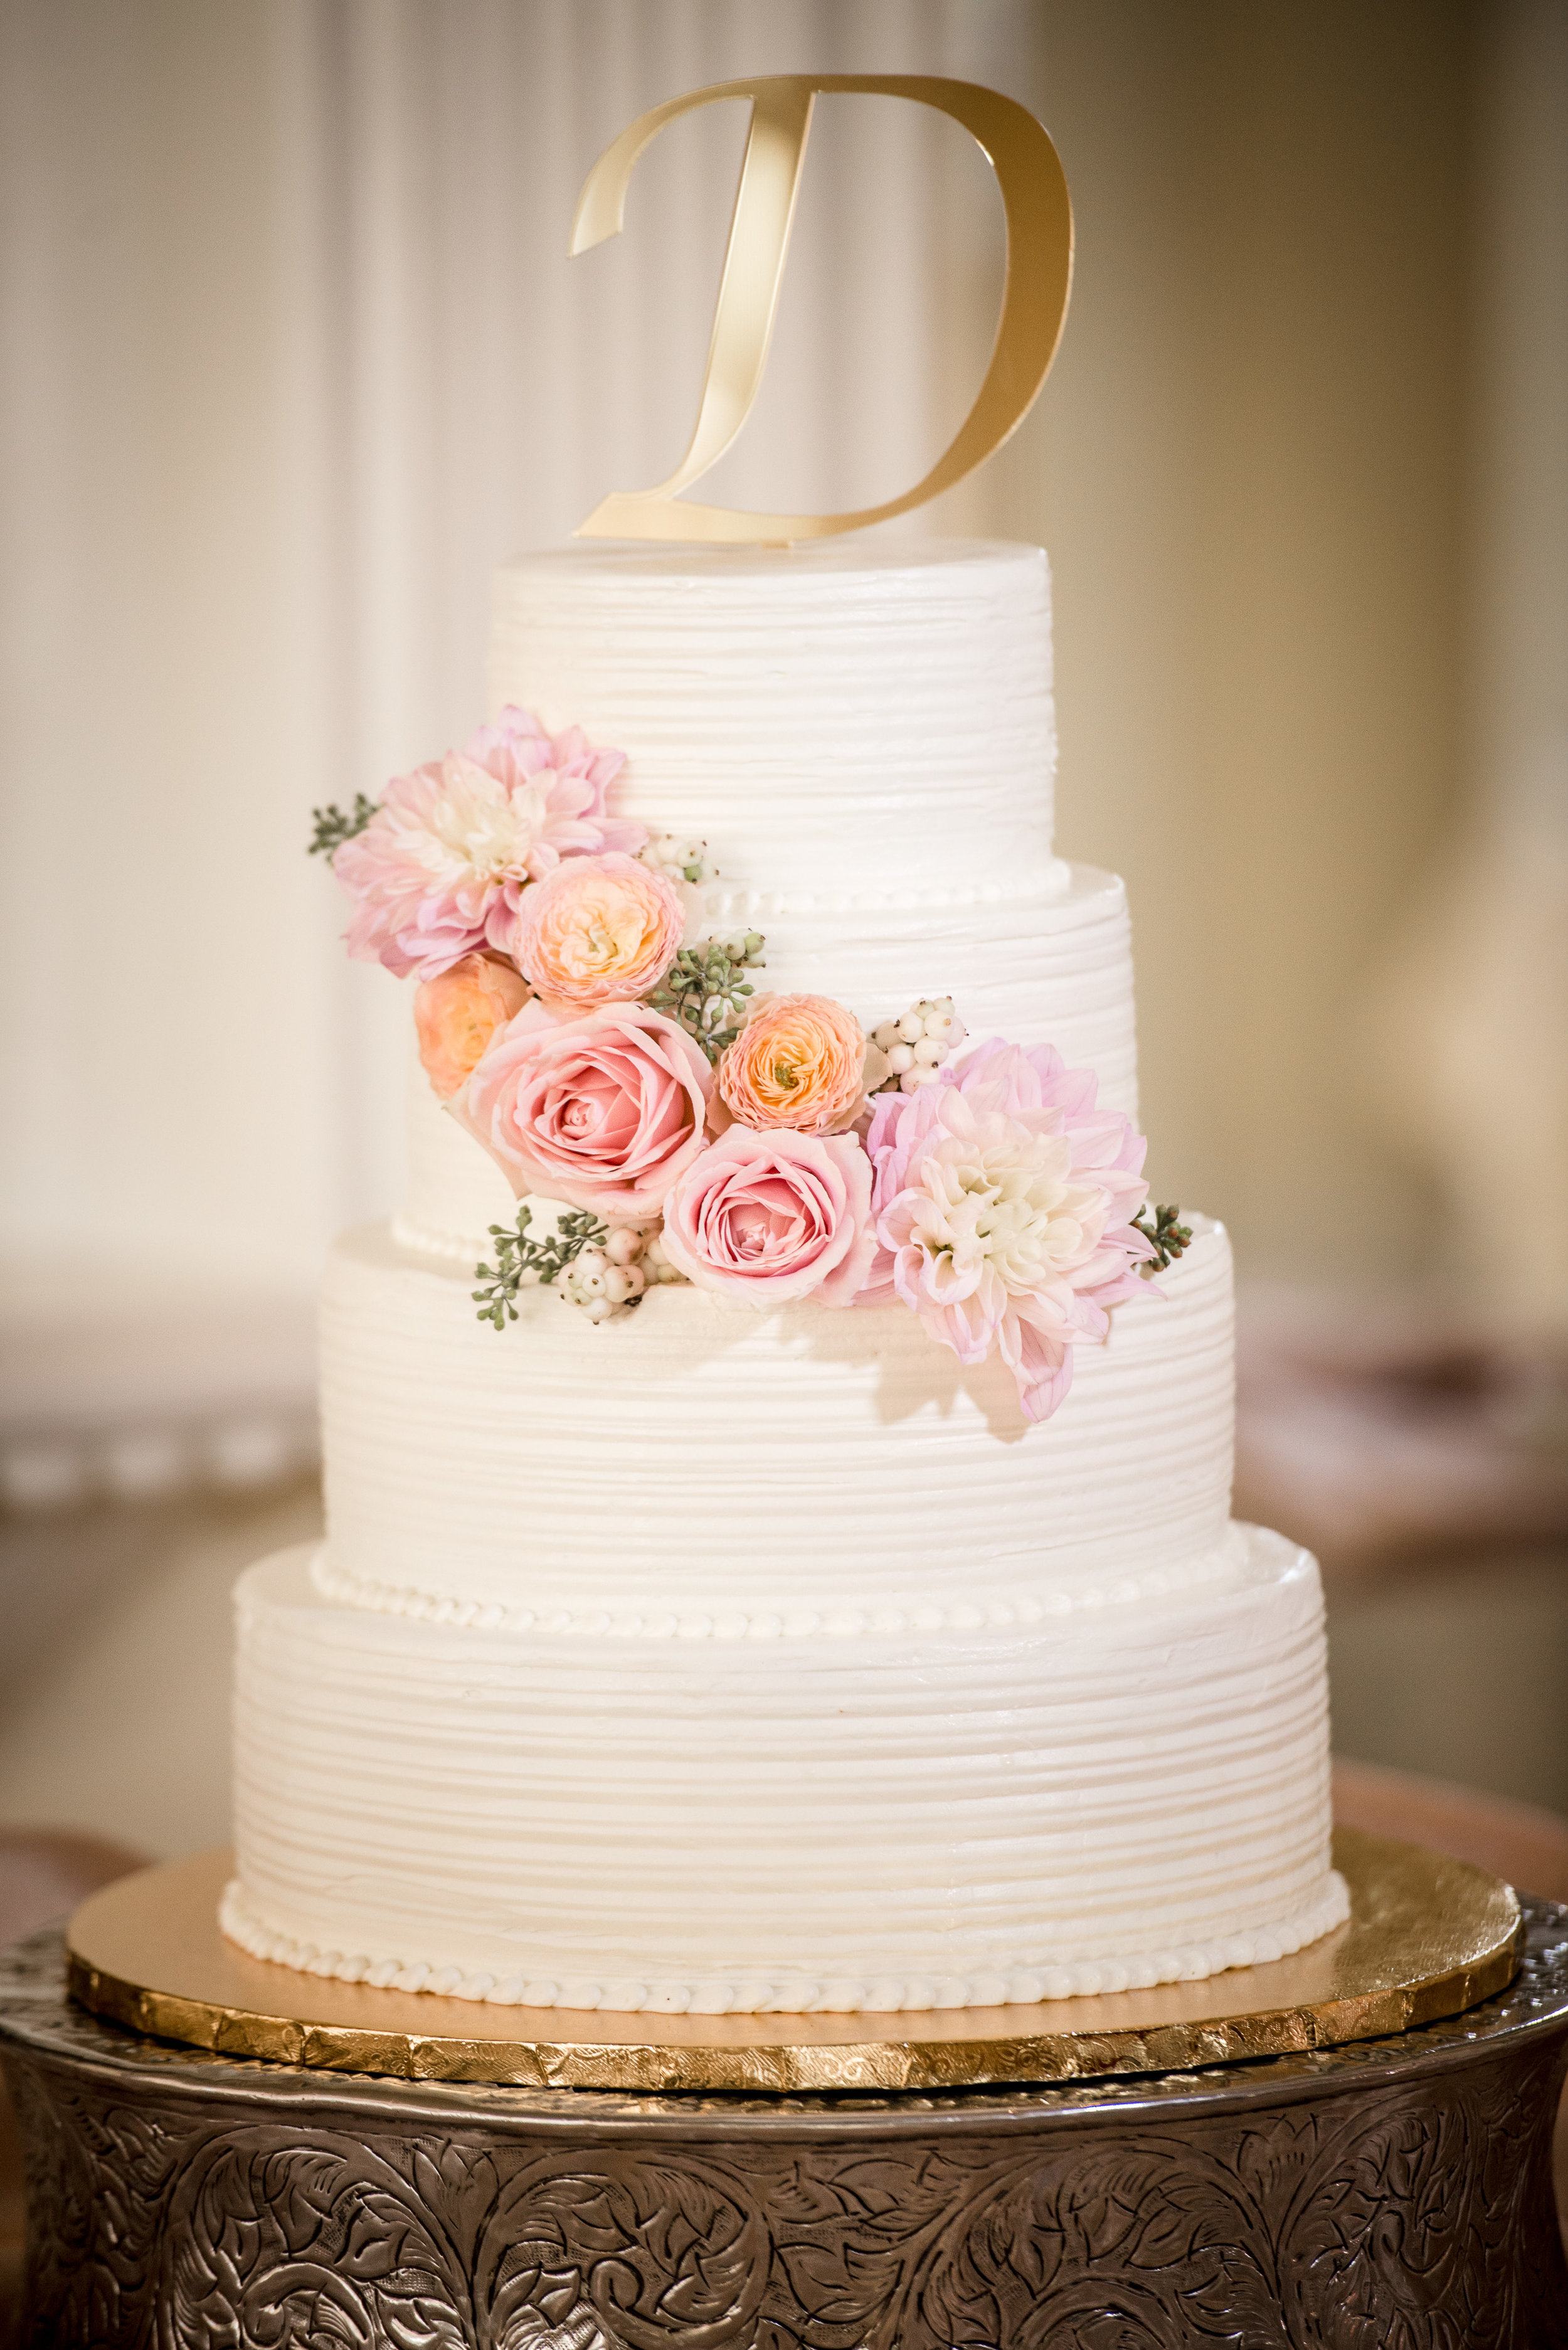 Wedding_Cake_Flowers_Blush_Pink_Vizcaya_Sacramento_Violette_Fleurs.jpg